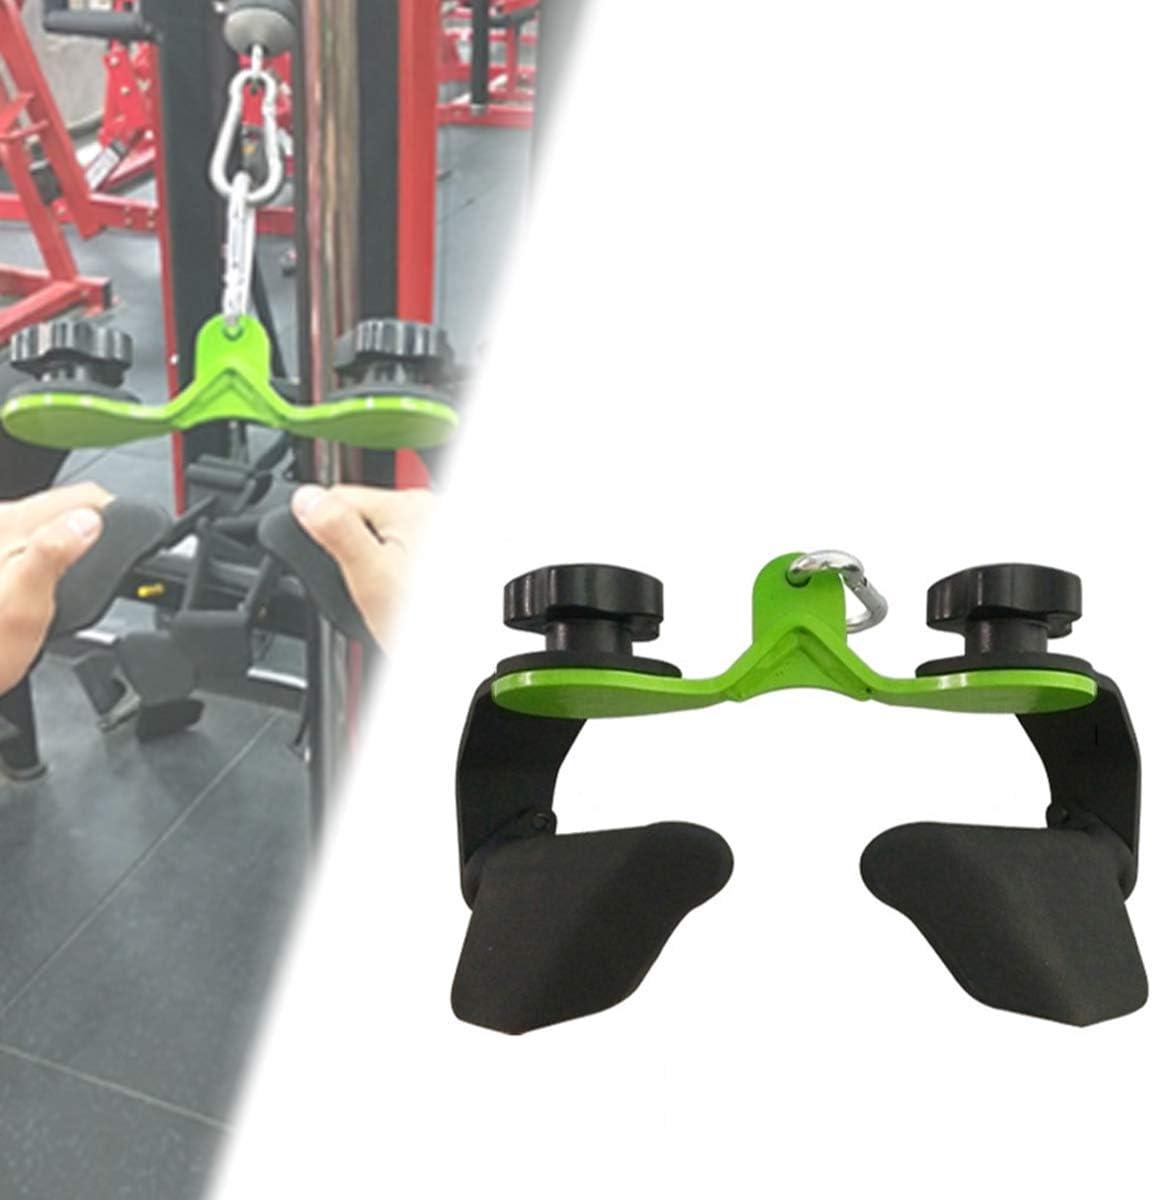 Parallel-Ergogriff Ycrdtap Rudergriff Eng Ohne Drehgelenk Vollstahl F/ür Bodybuilding Crossfit Krafttraining Fitness Training Gym Sport